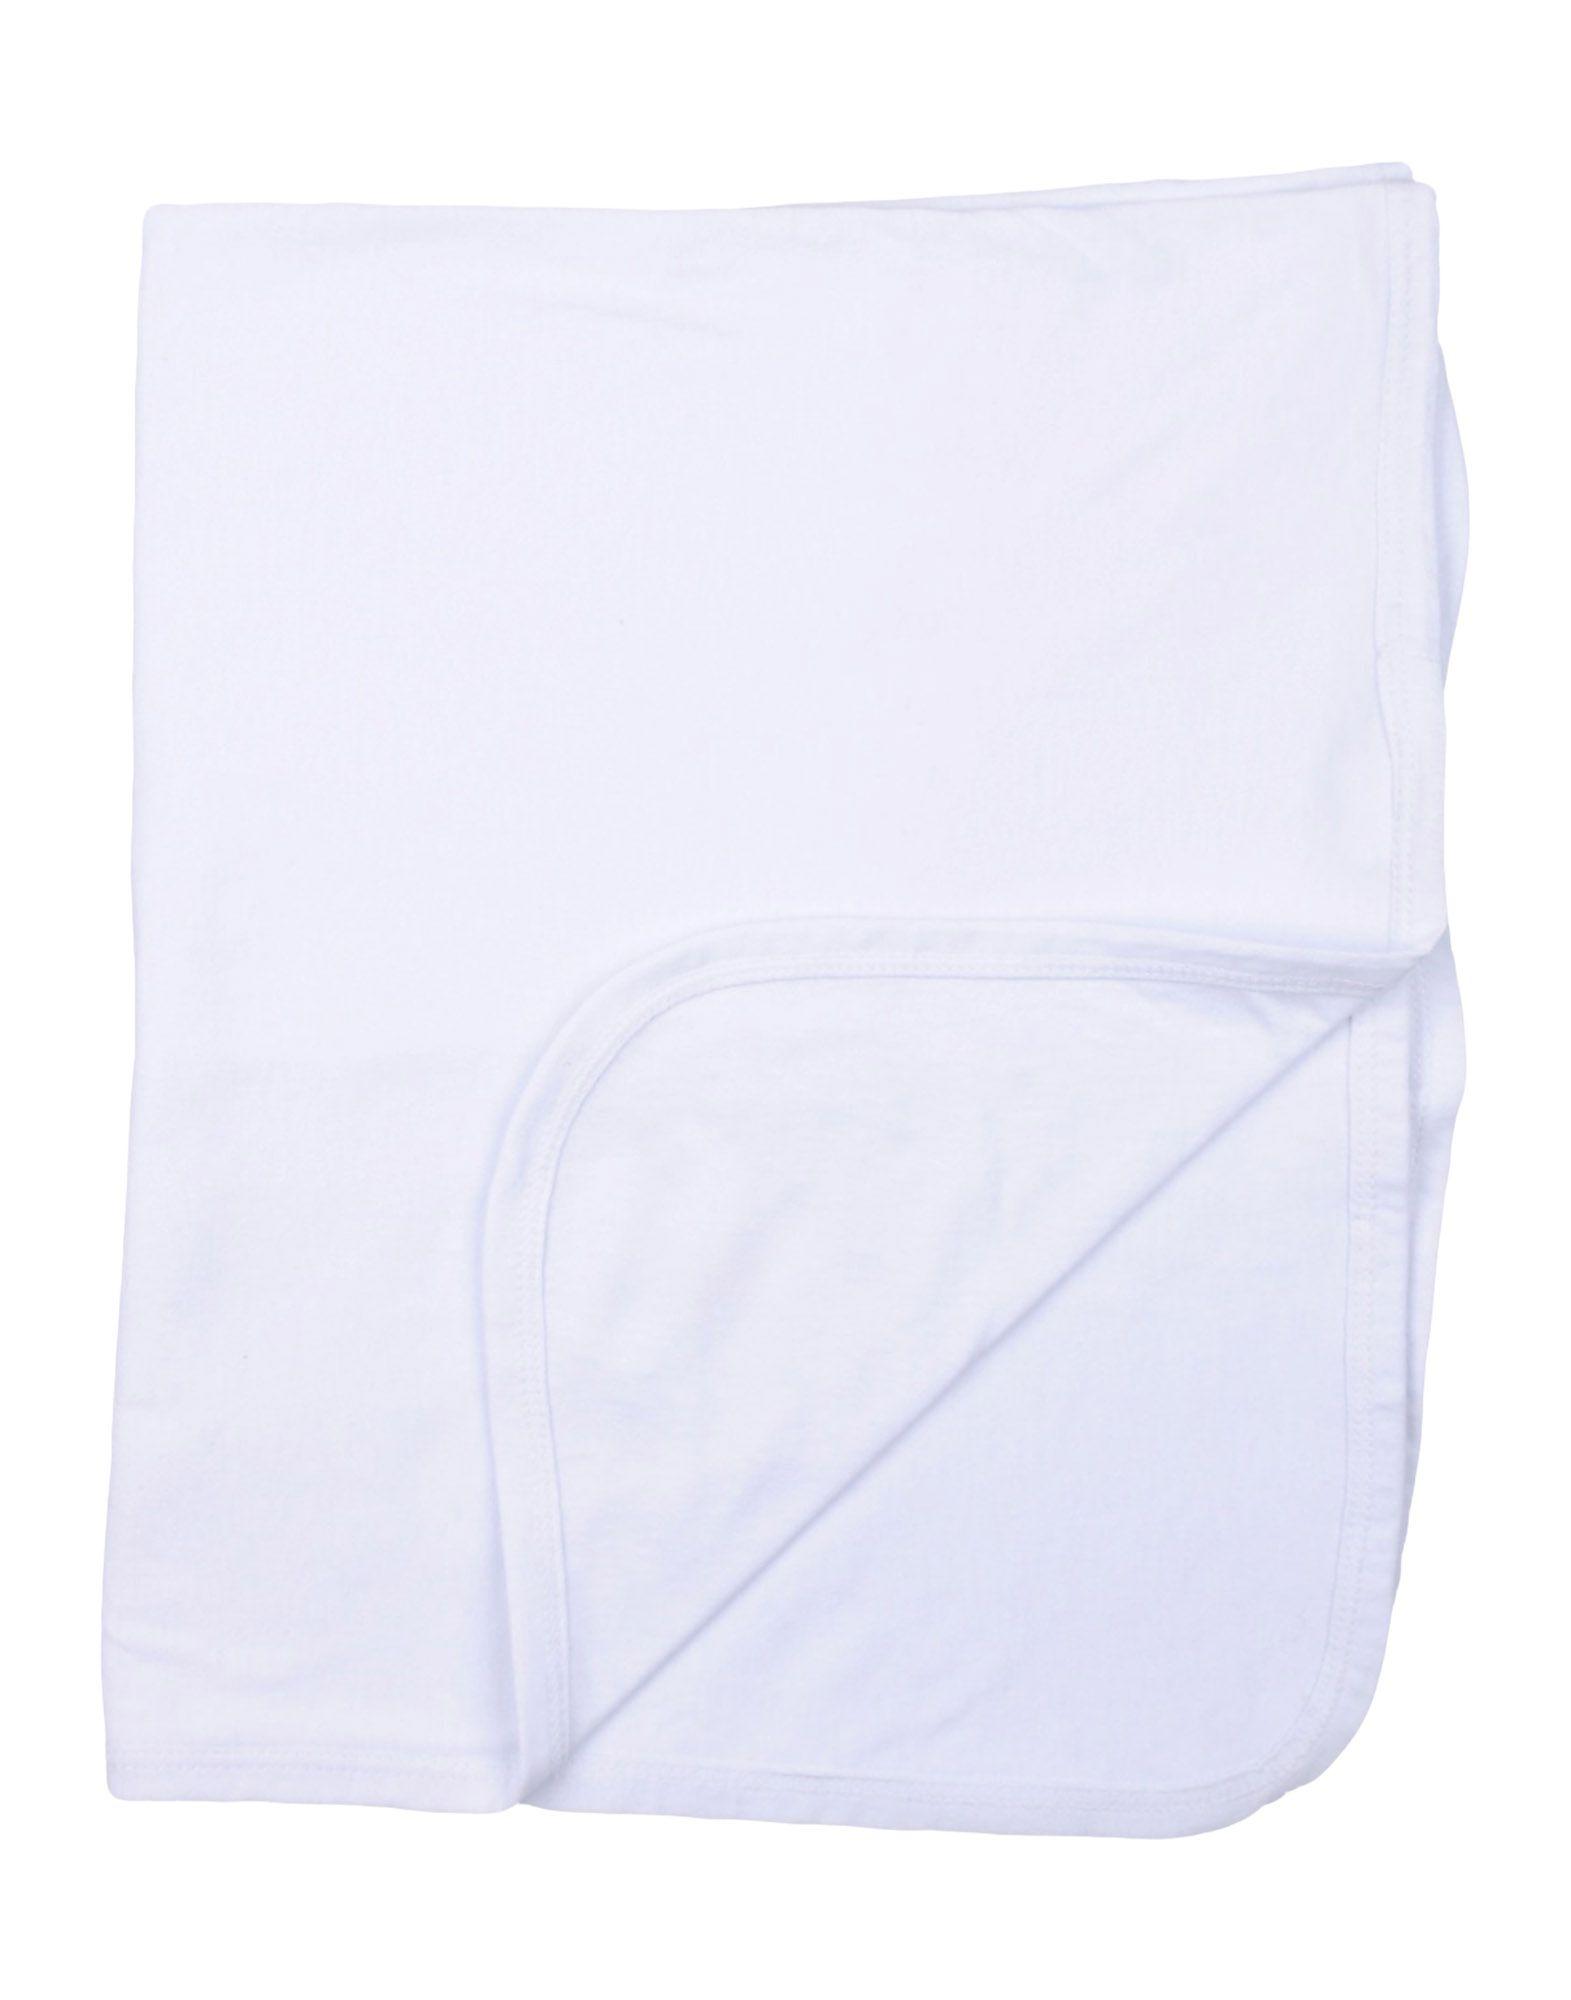 COCCODÉ Одеяльце для младенцев nanán одеяльце для младенцев